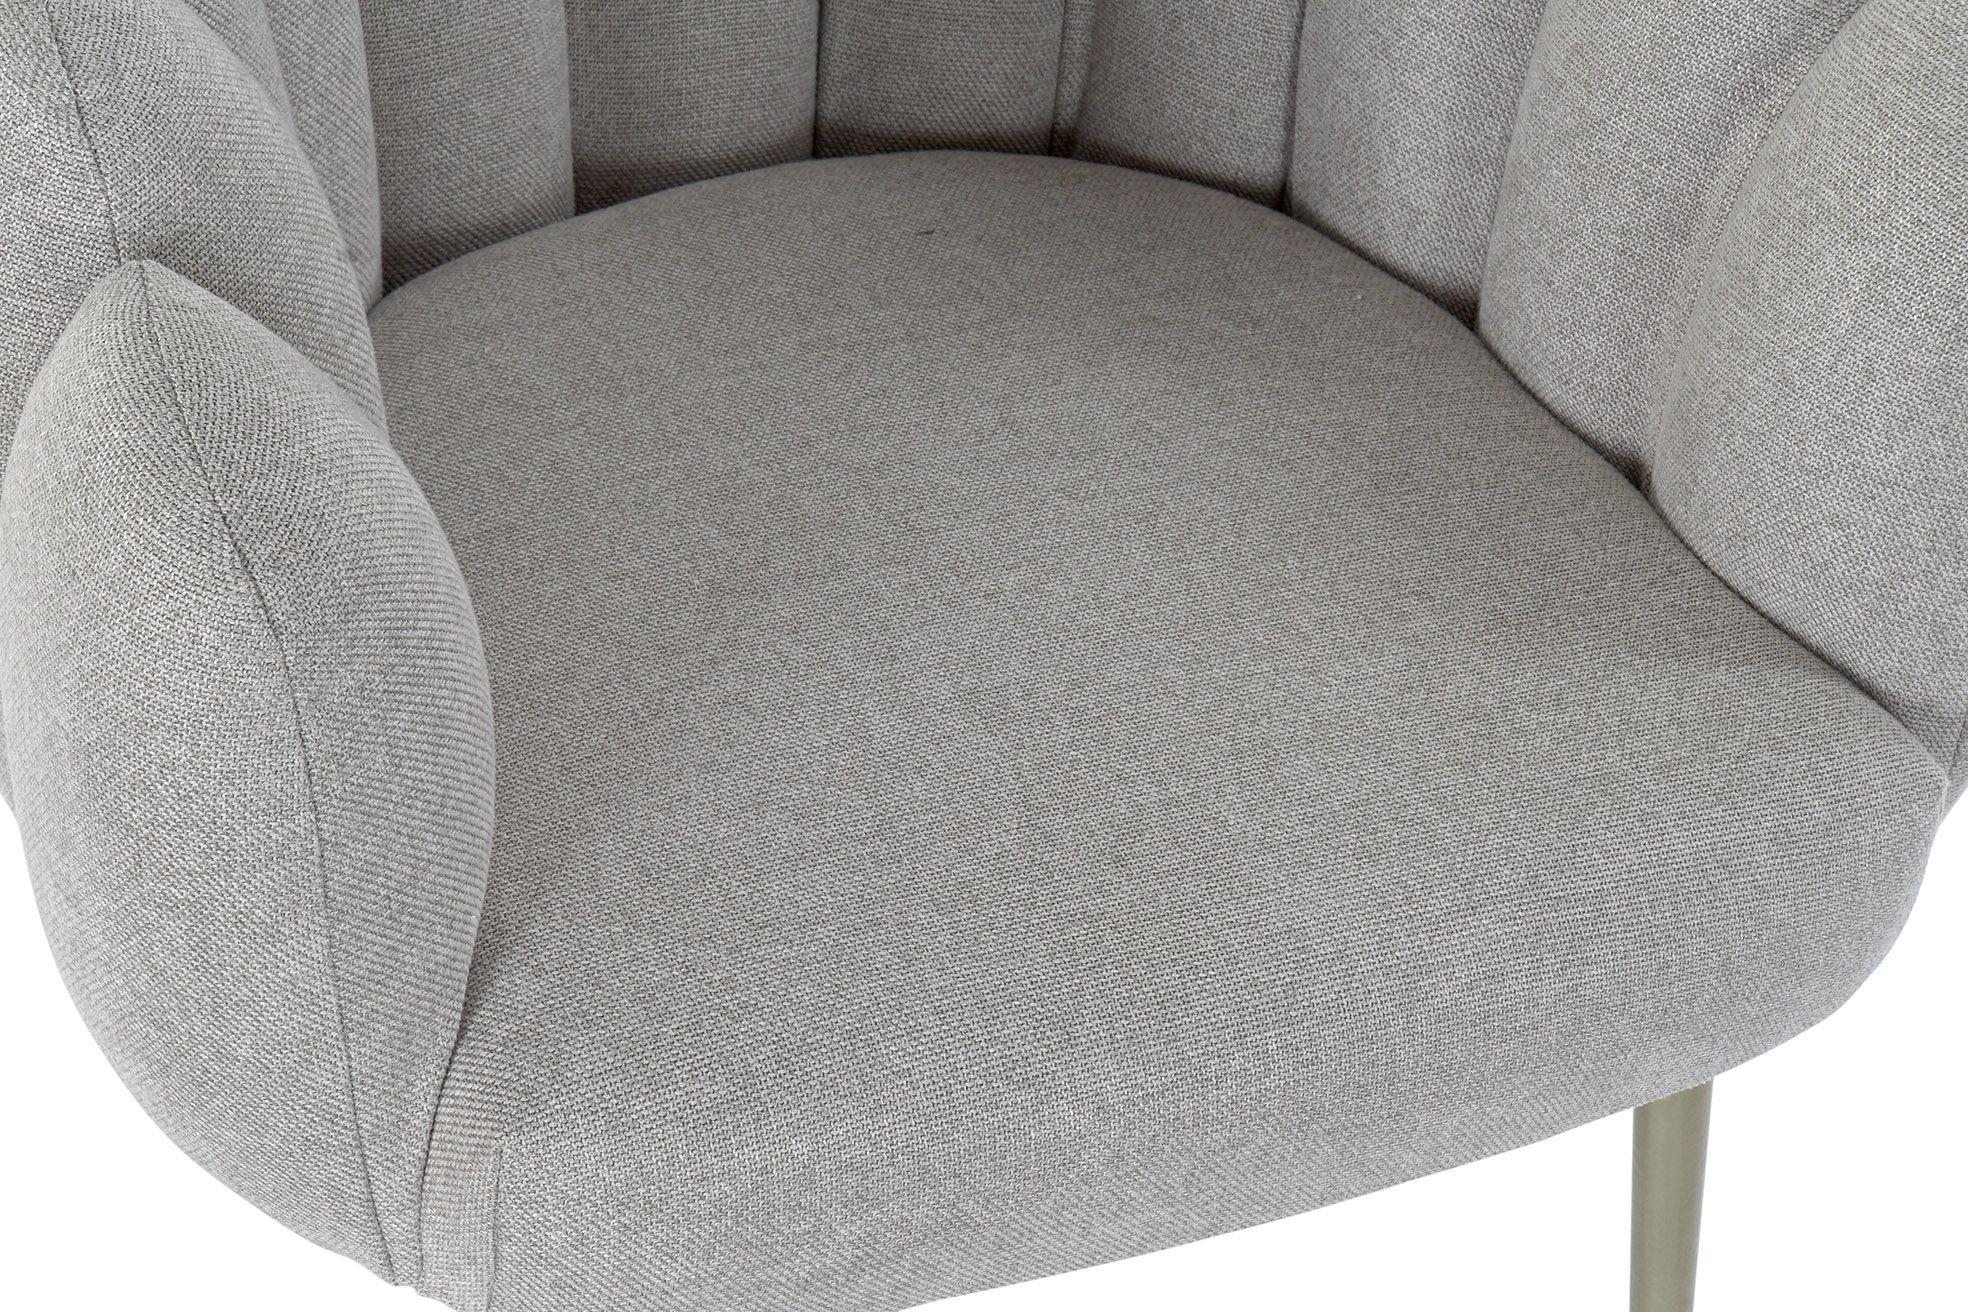 31905-sillon-shell-tejido-greige-1.jpg